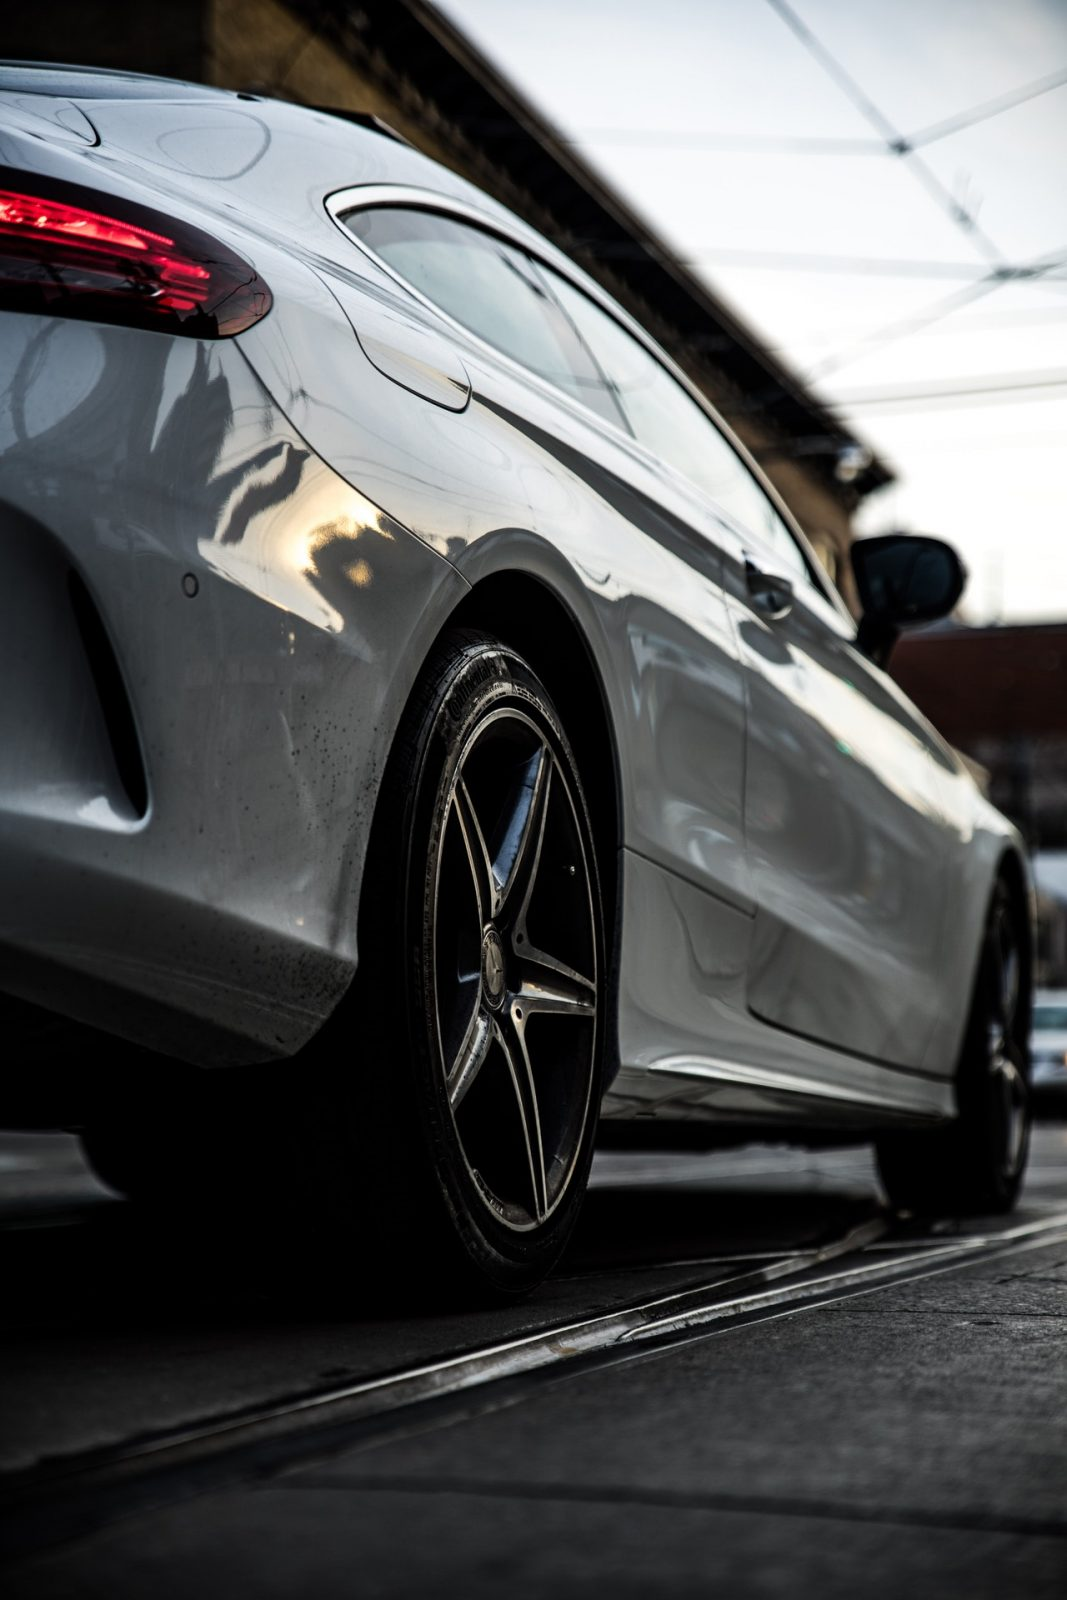 besparen-zakelijke-autokosten-tipify